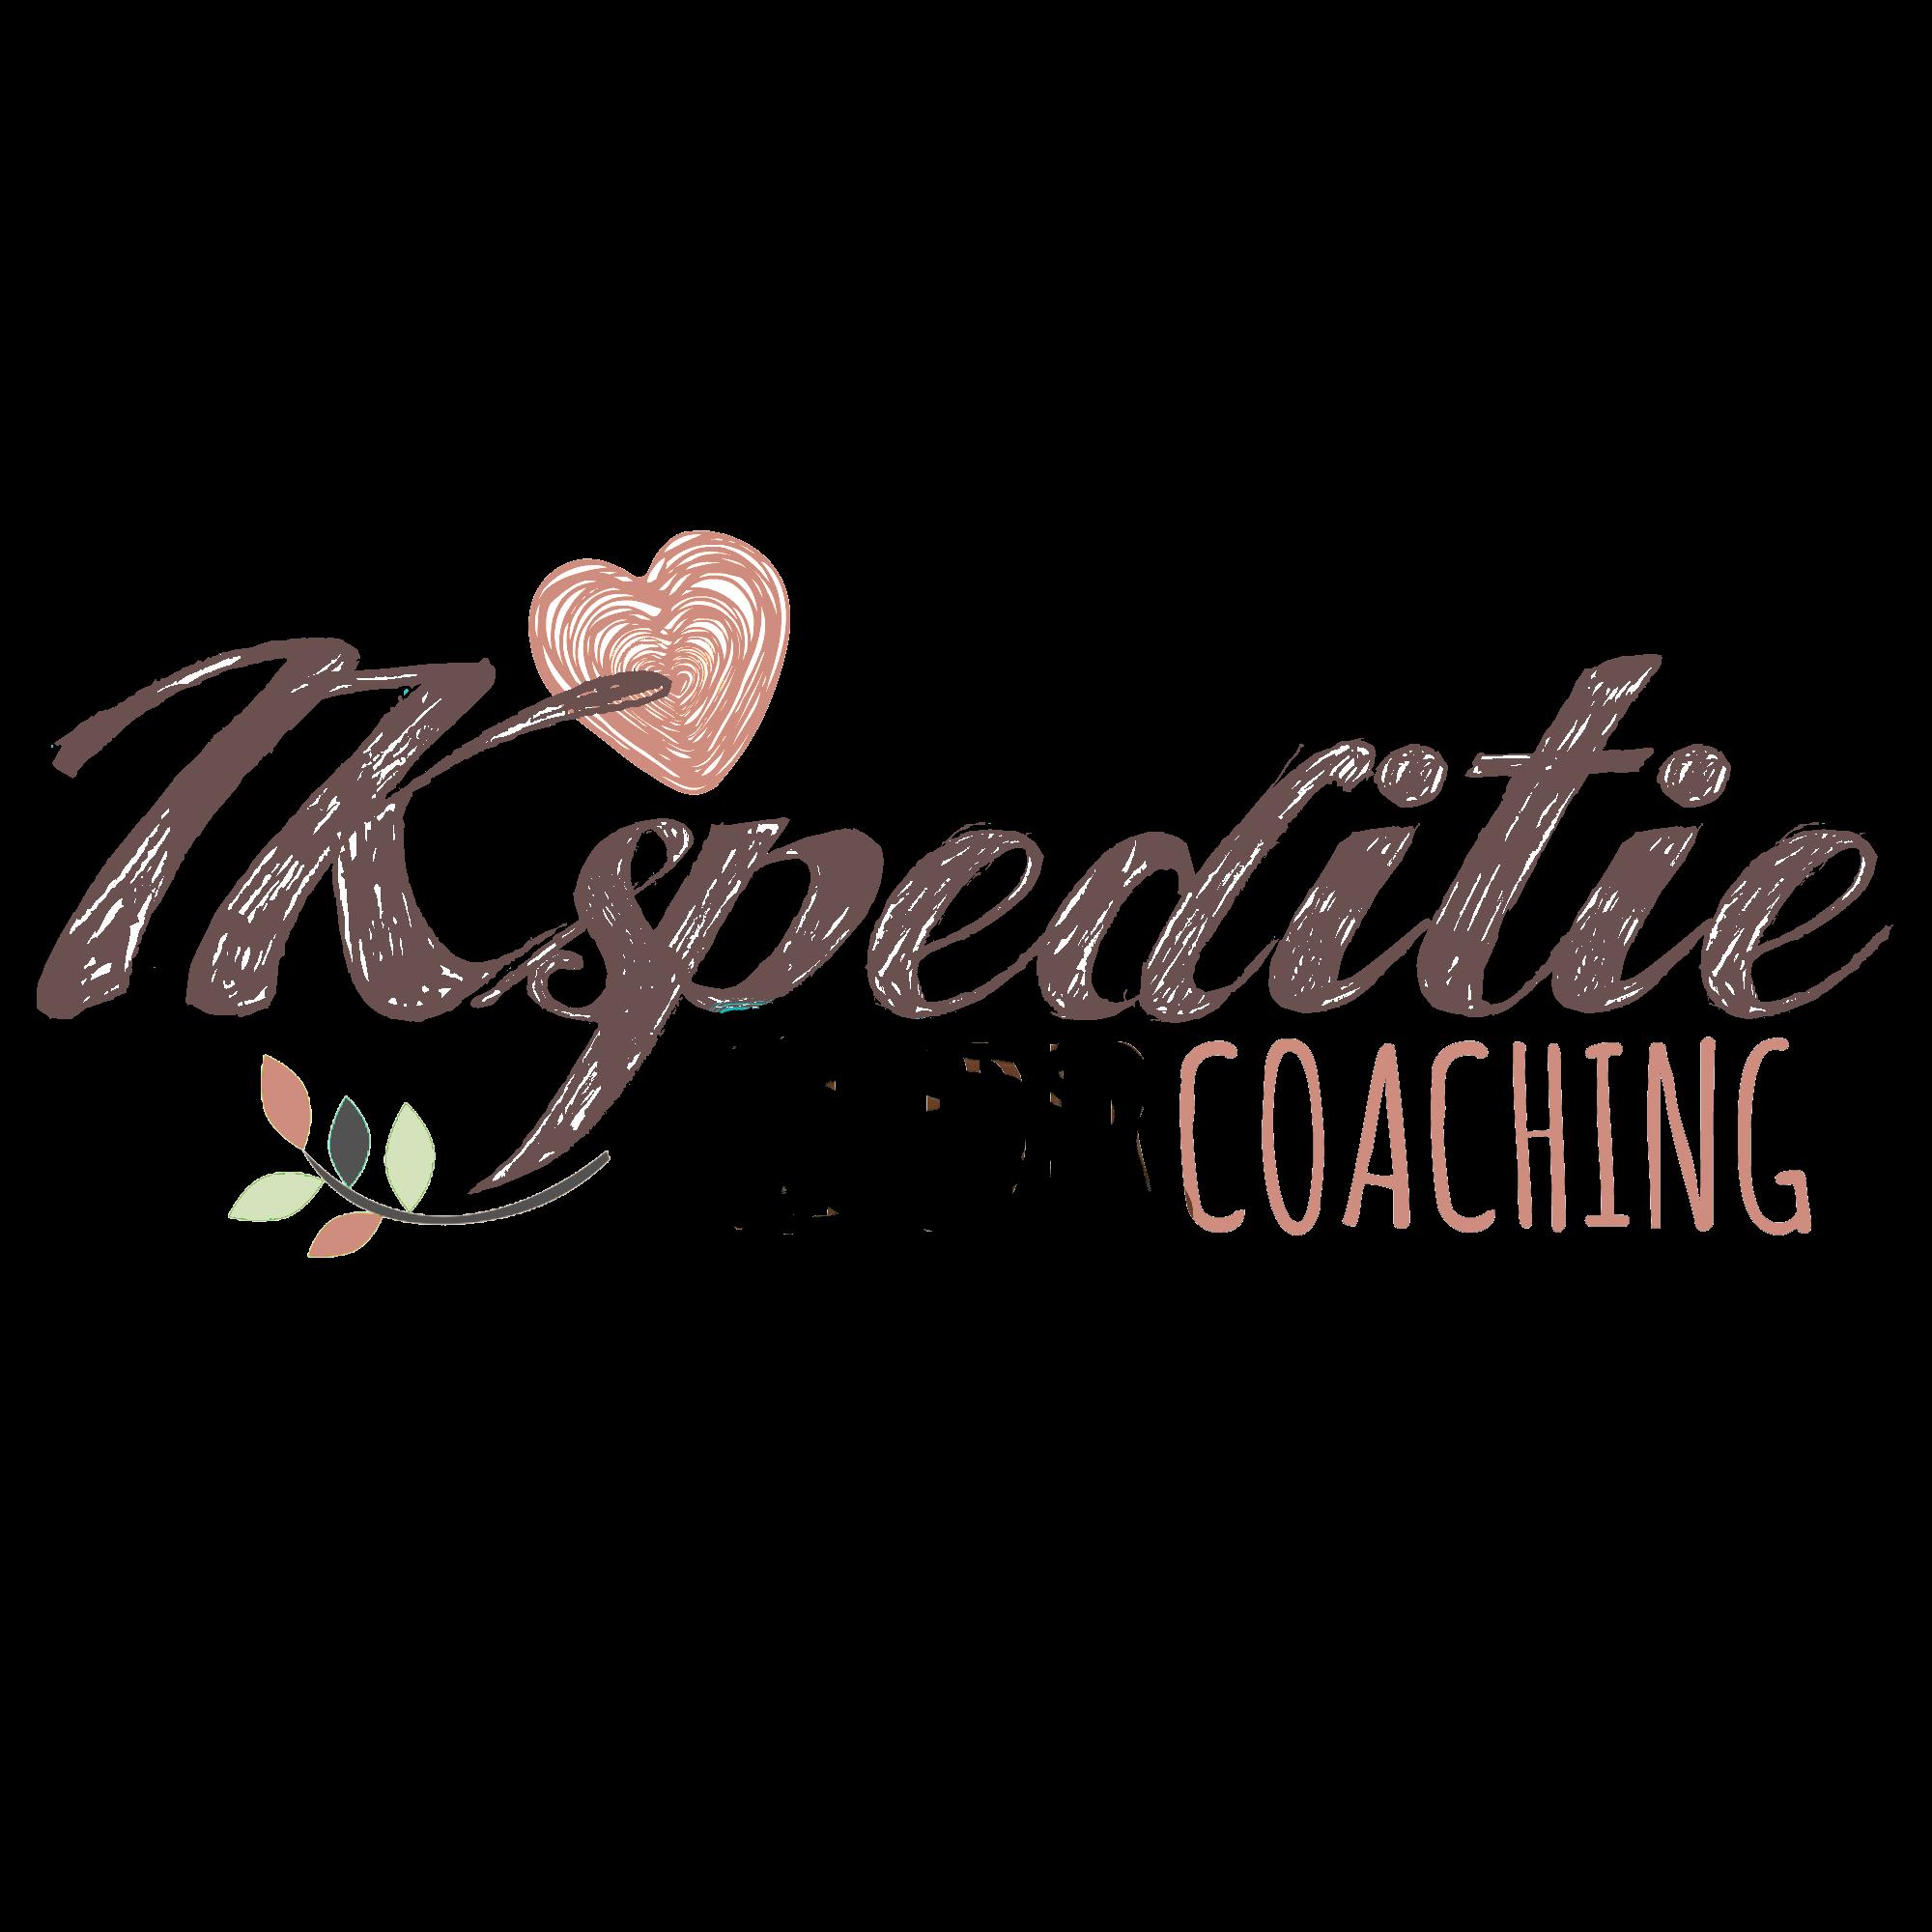 Ikspeditie Coaching